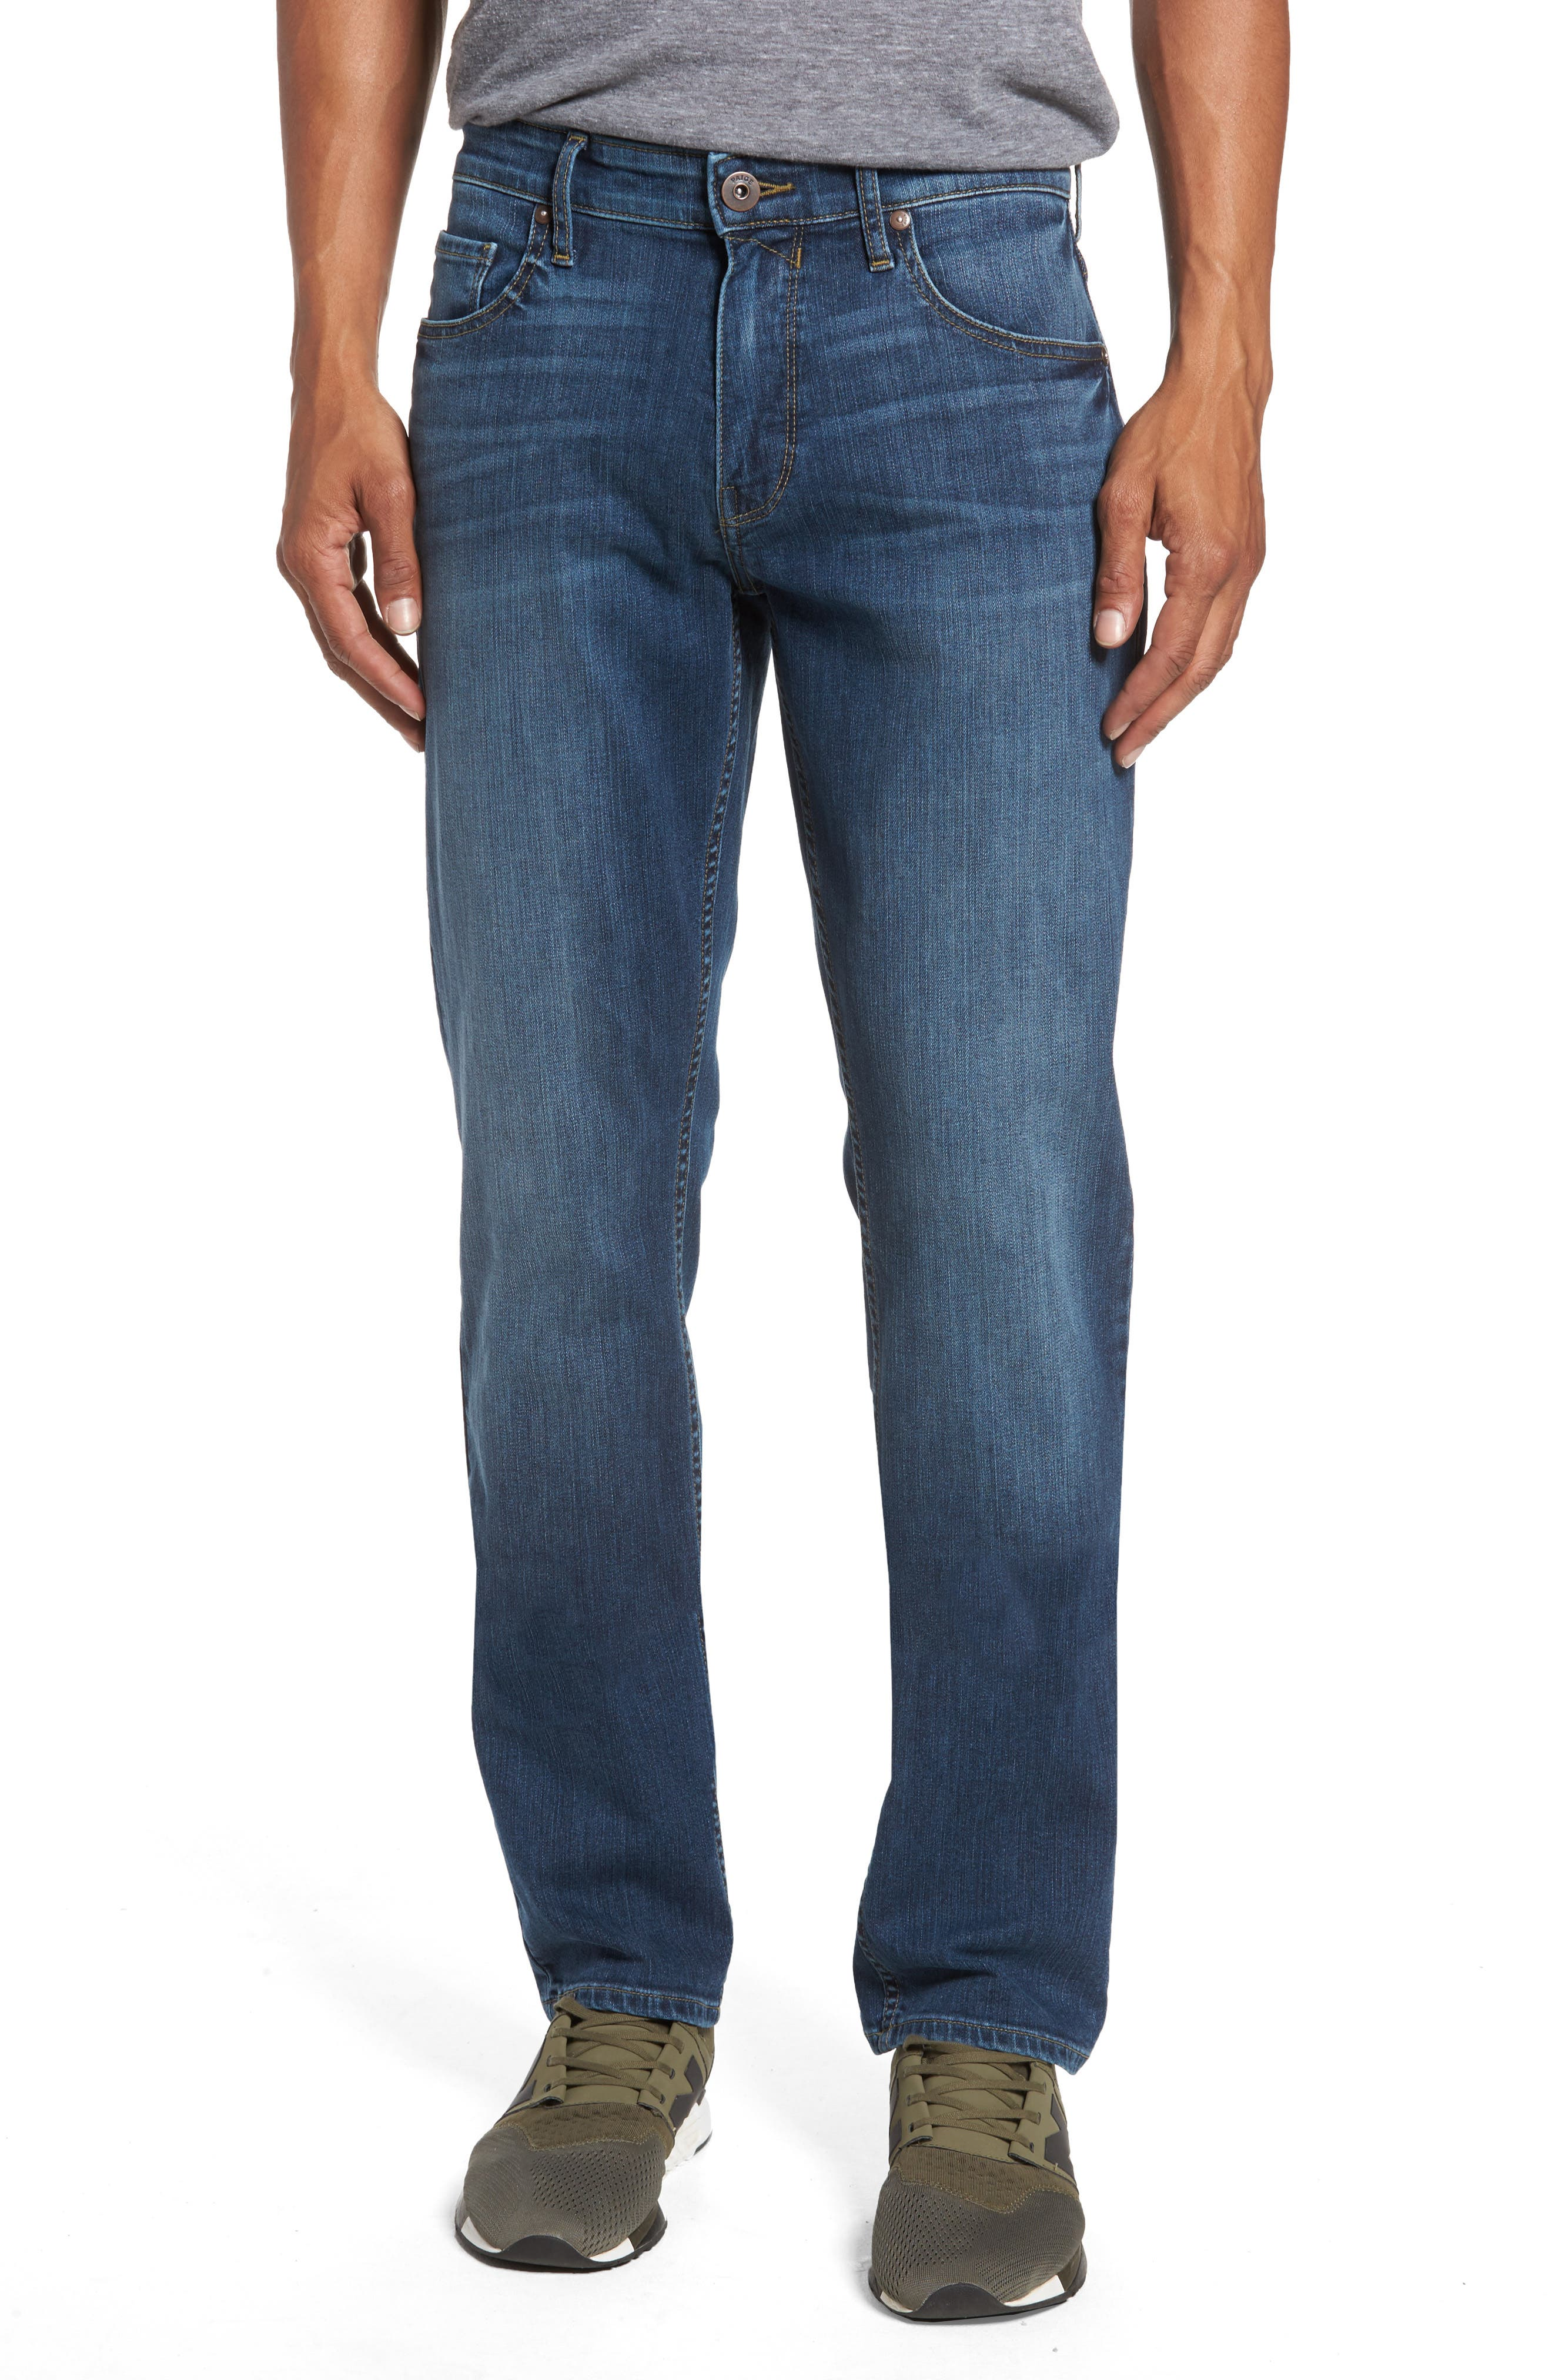 PAIGE Legacy - Federal Slim Straight Fit Jeans (Indie)